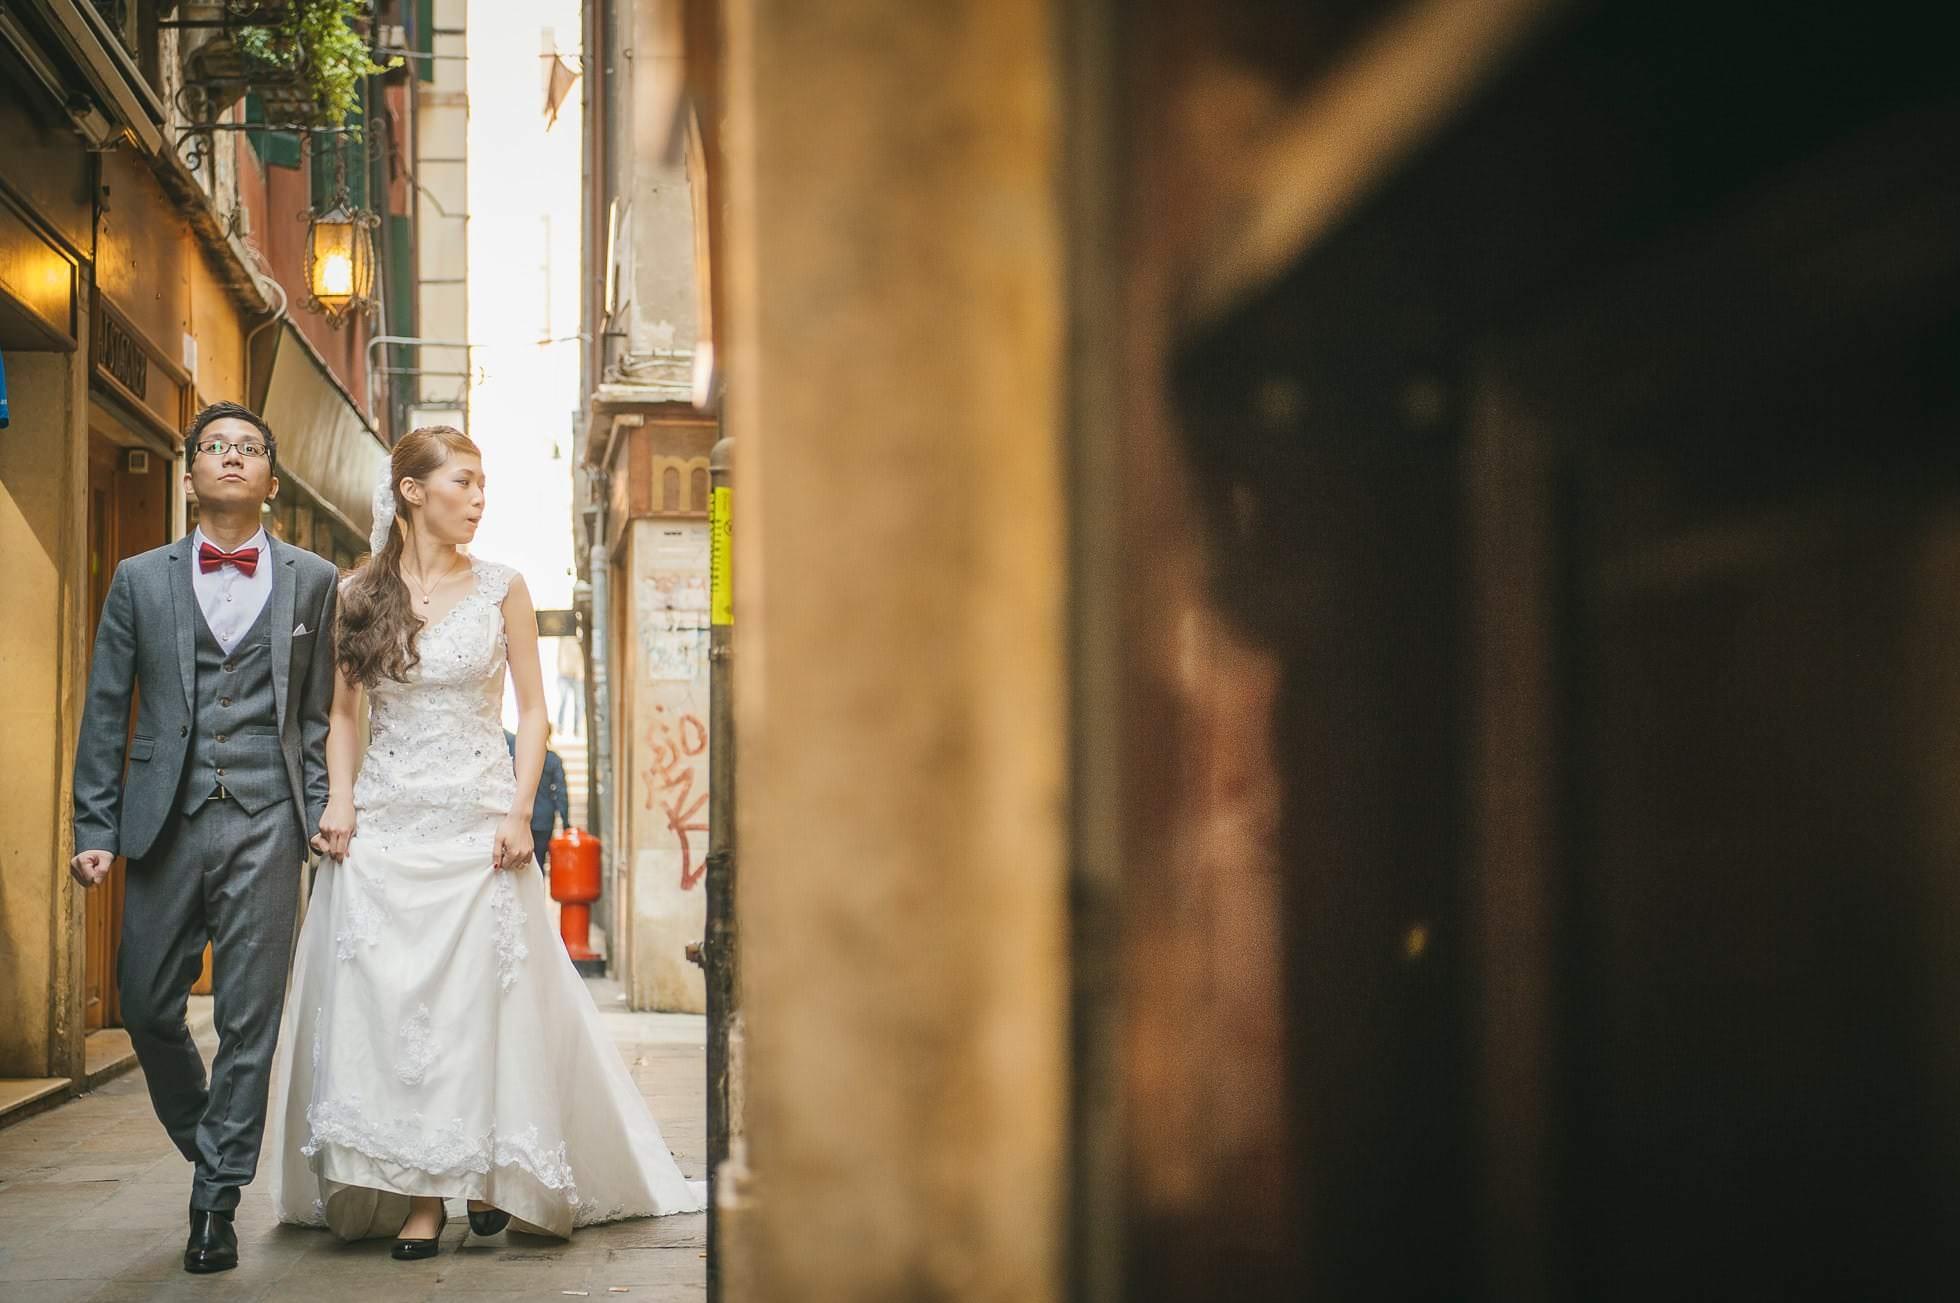 Fotografo matrimonio passeggiata venezia